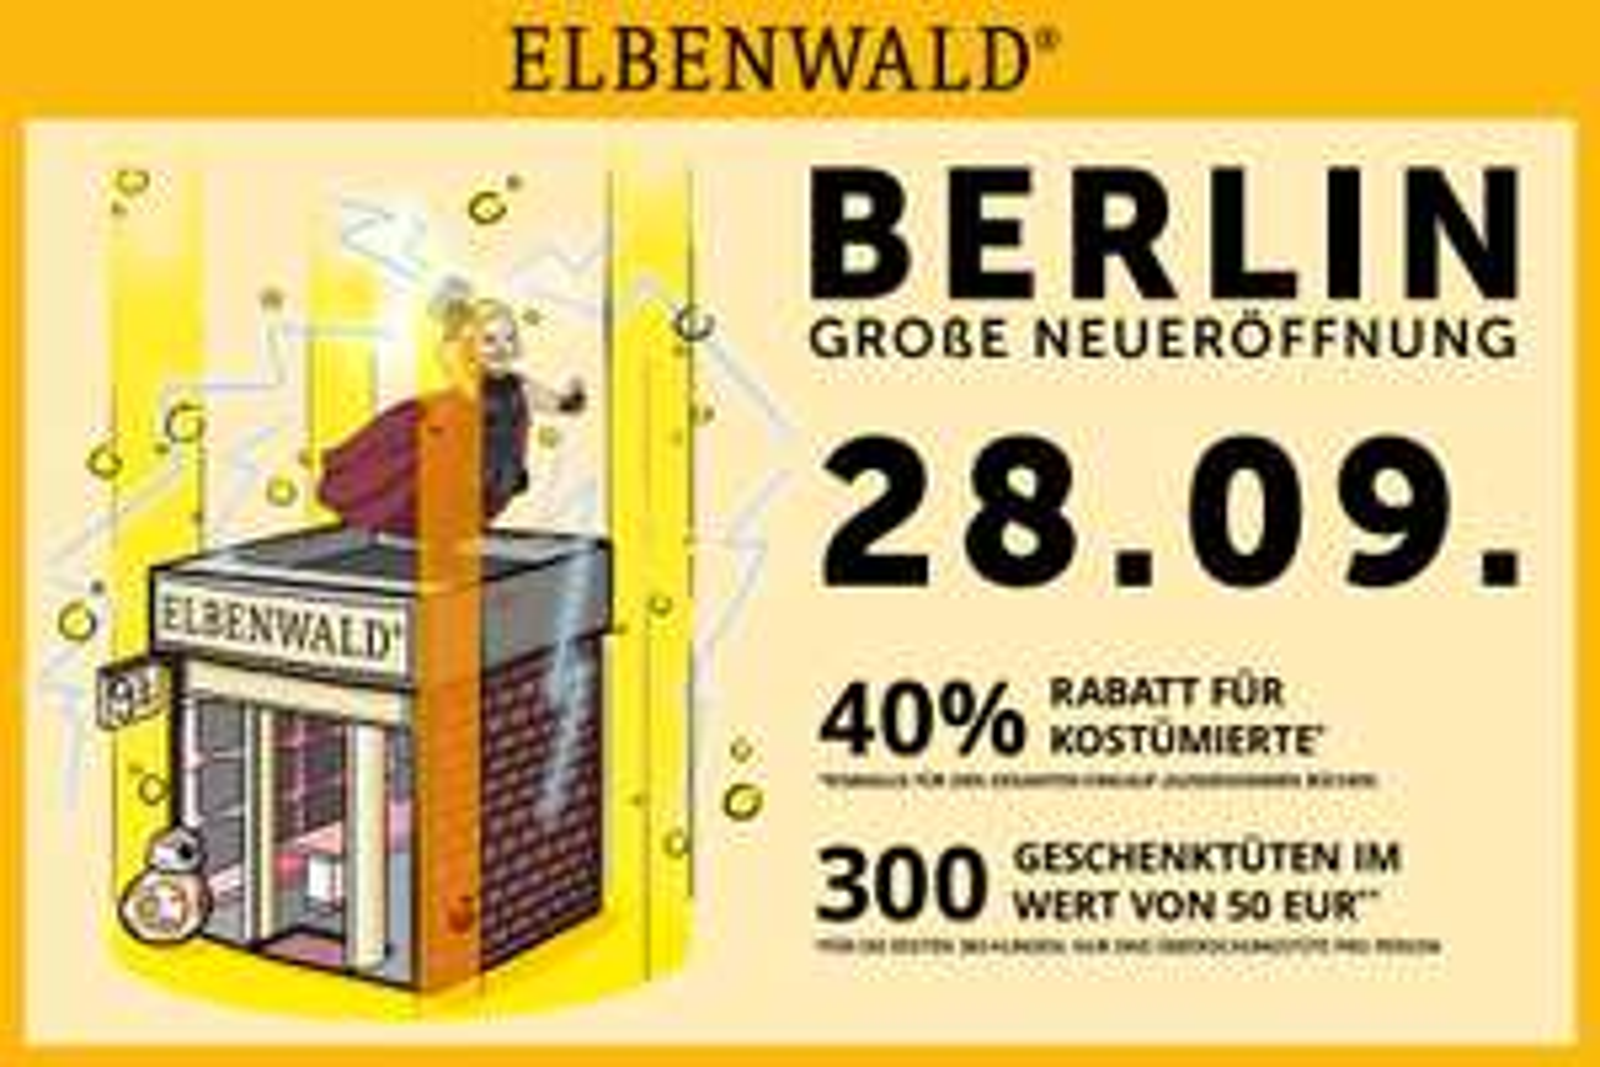 Lokal Berlin Elbenwald 40% Rabatt für Kostümierte 28.9